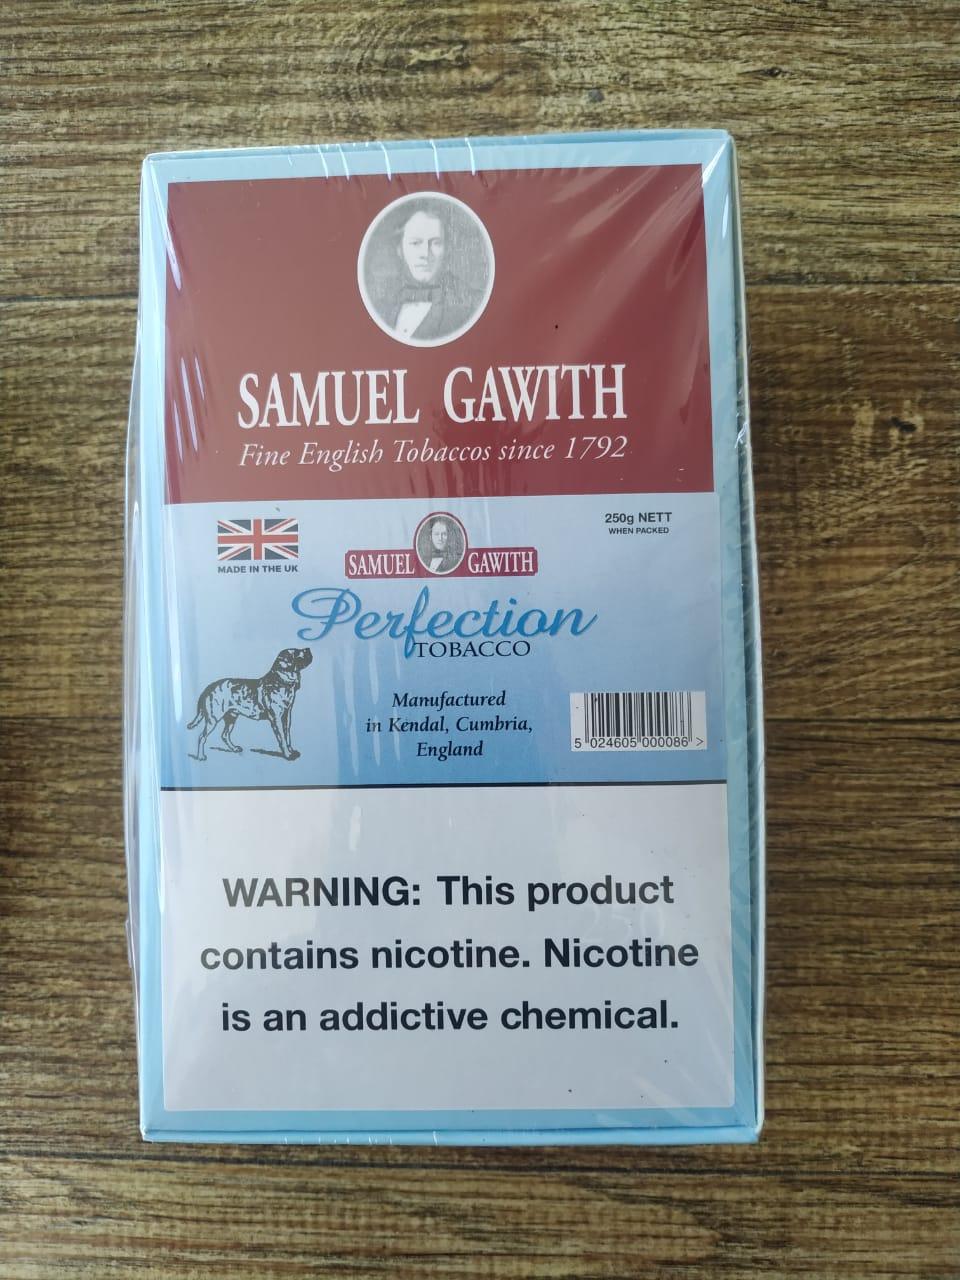 Samuel Gawith - Perfection - Caixa 250g